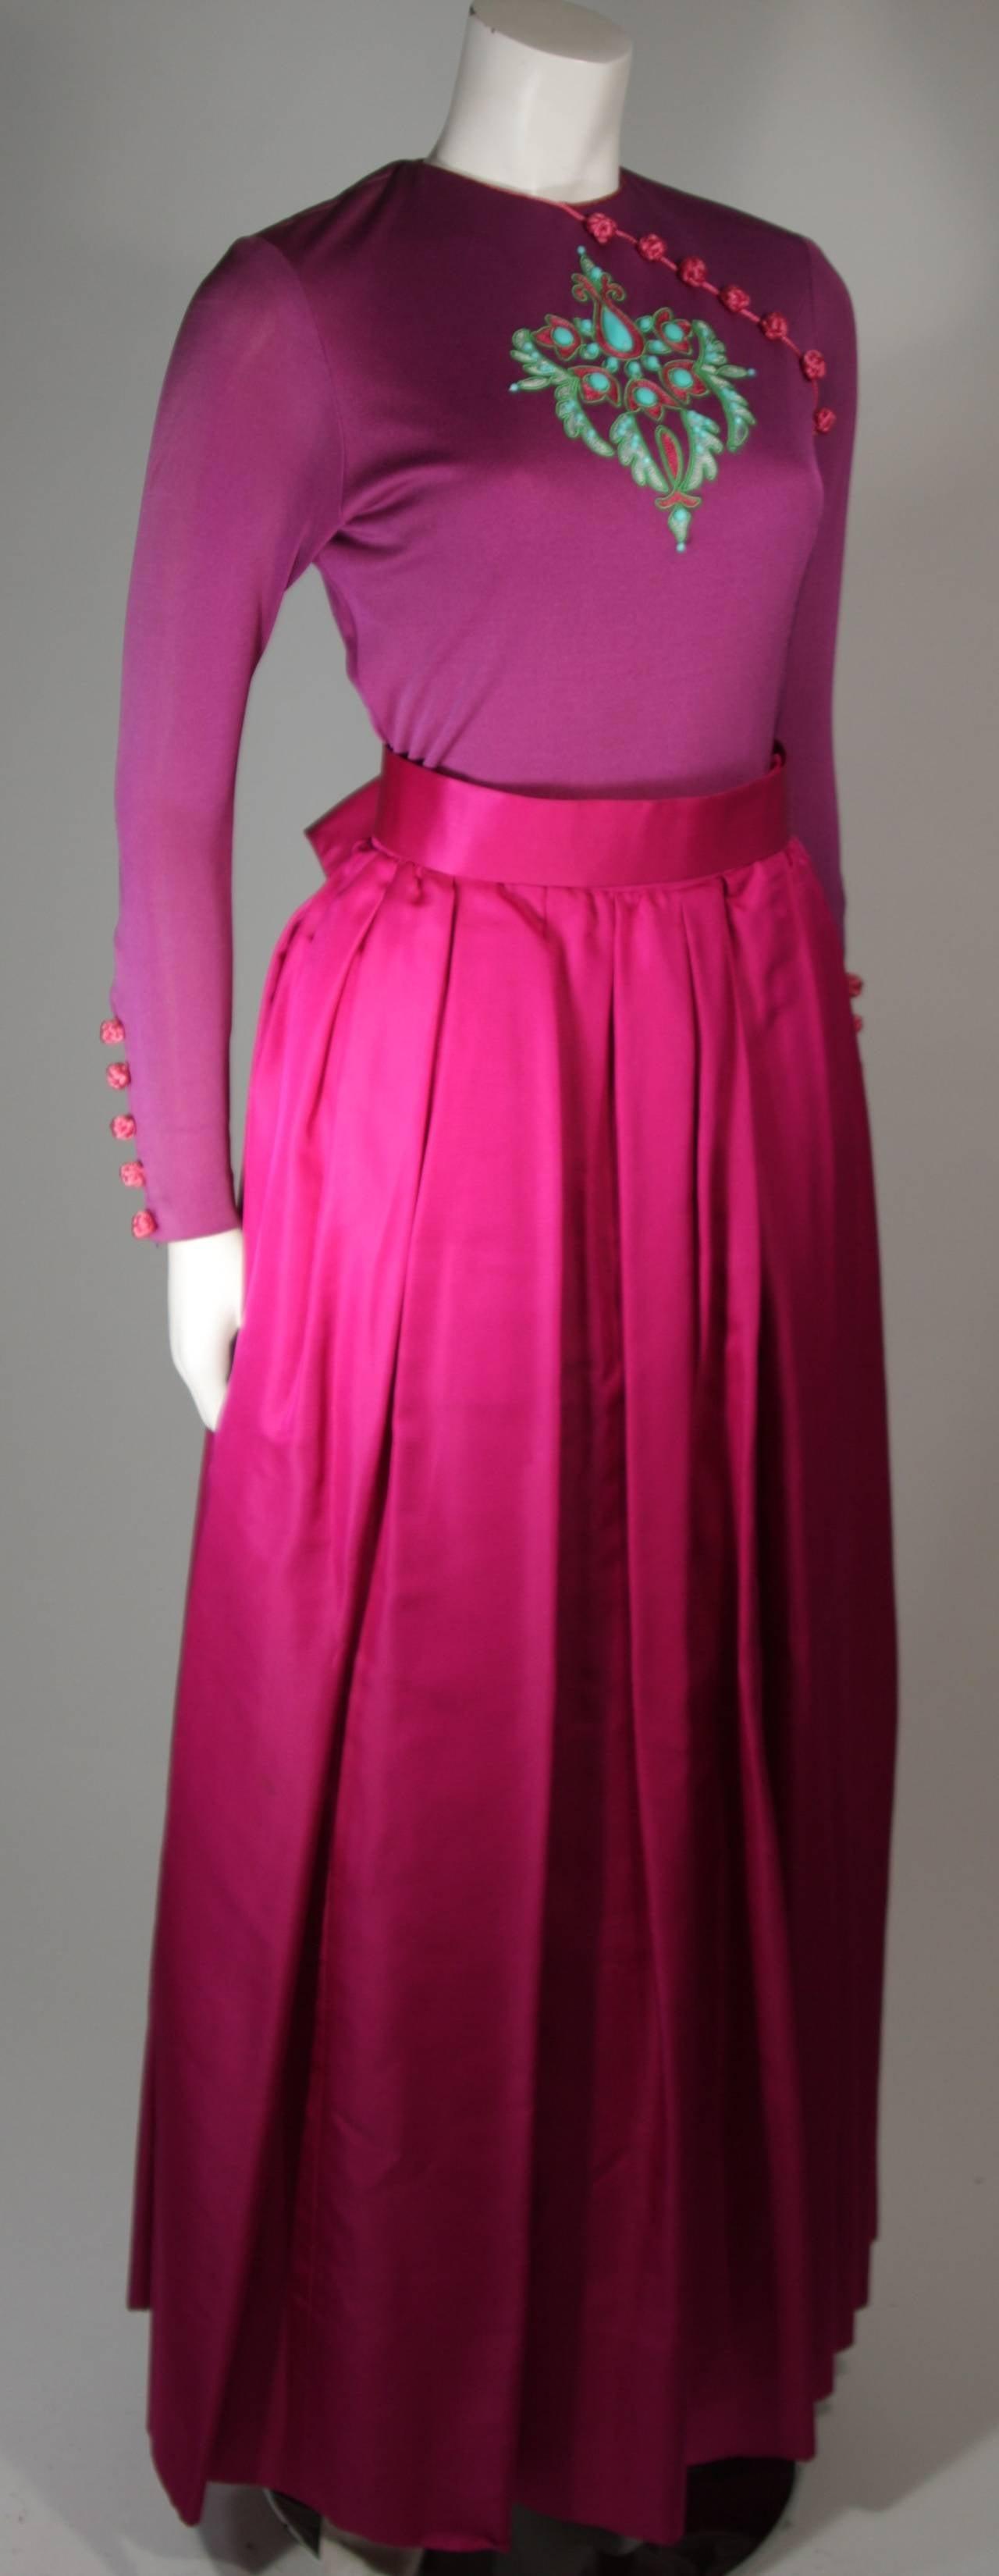 Bob Mackie Evening Skirt Set Ensemble in Purple Size Small 4